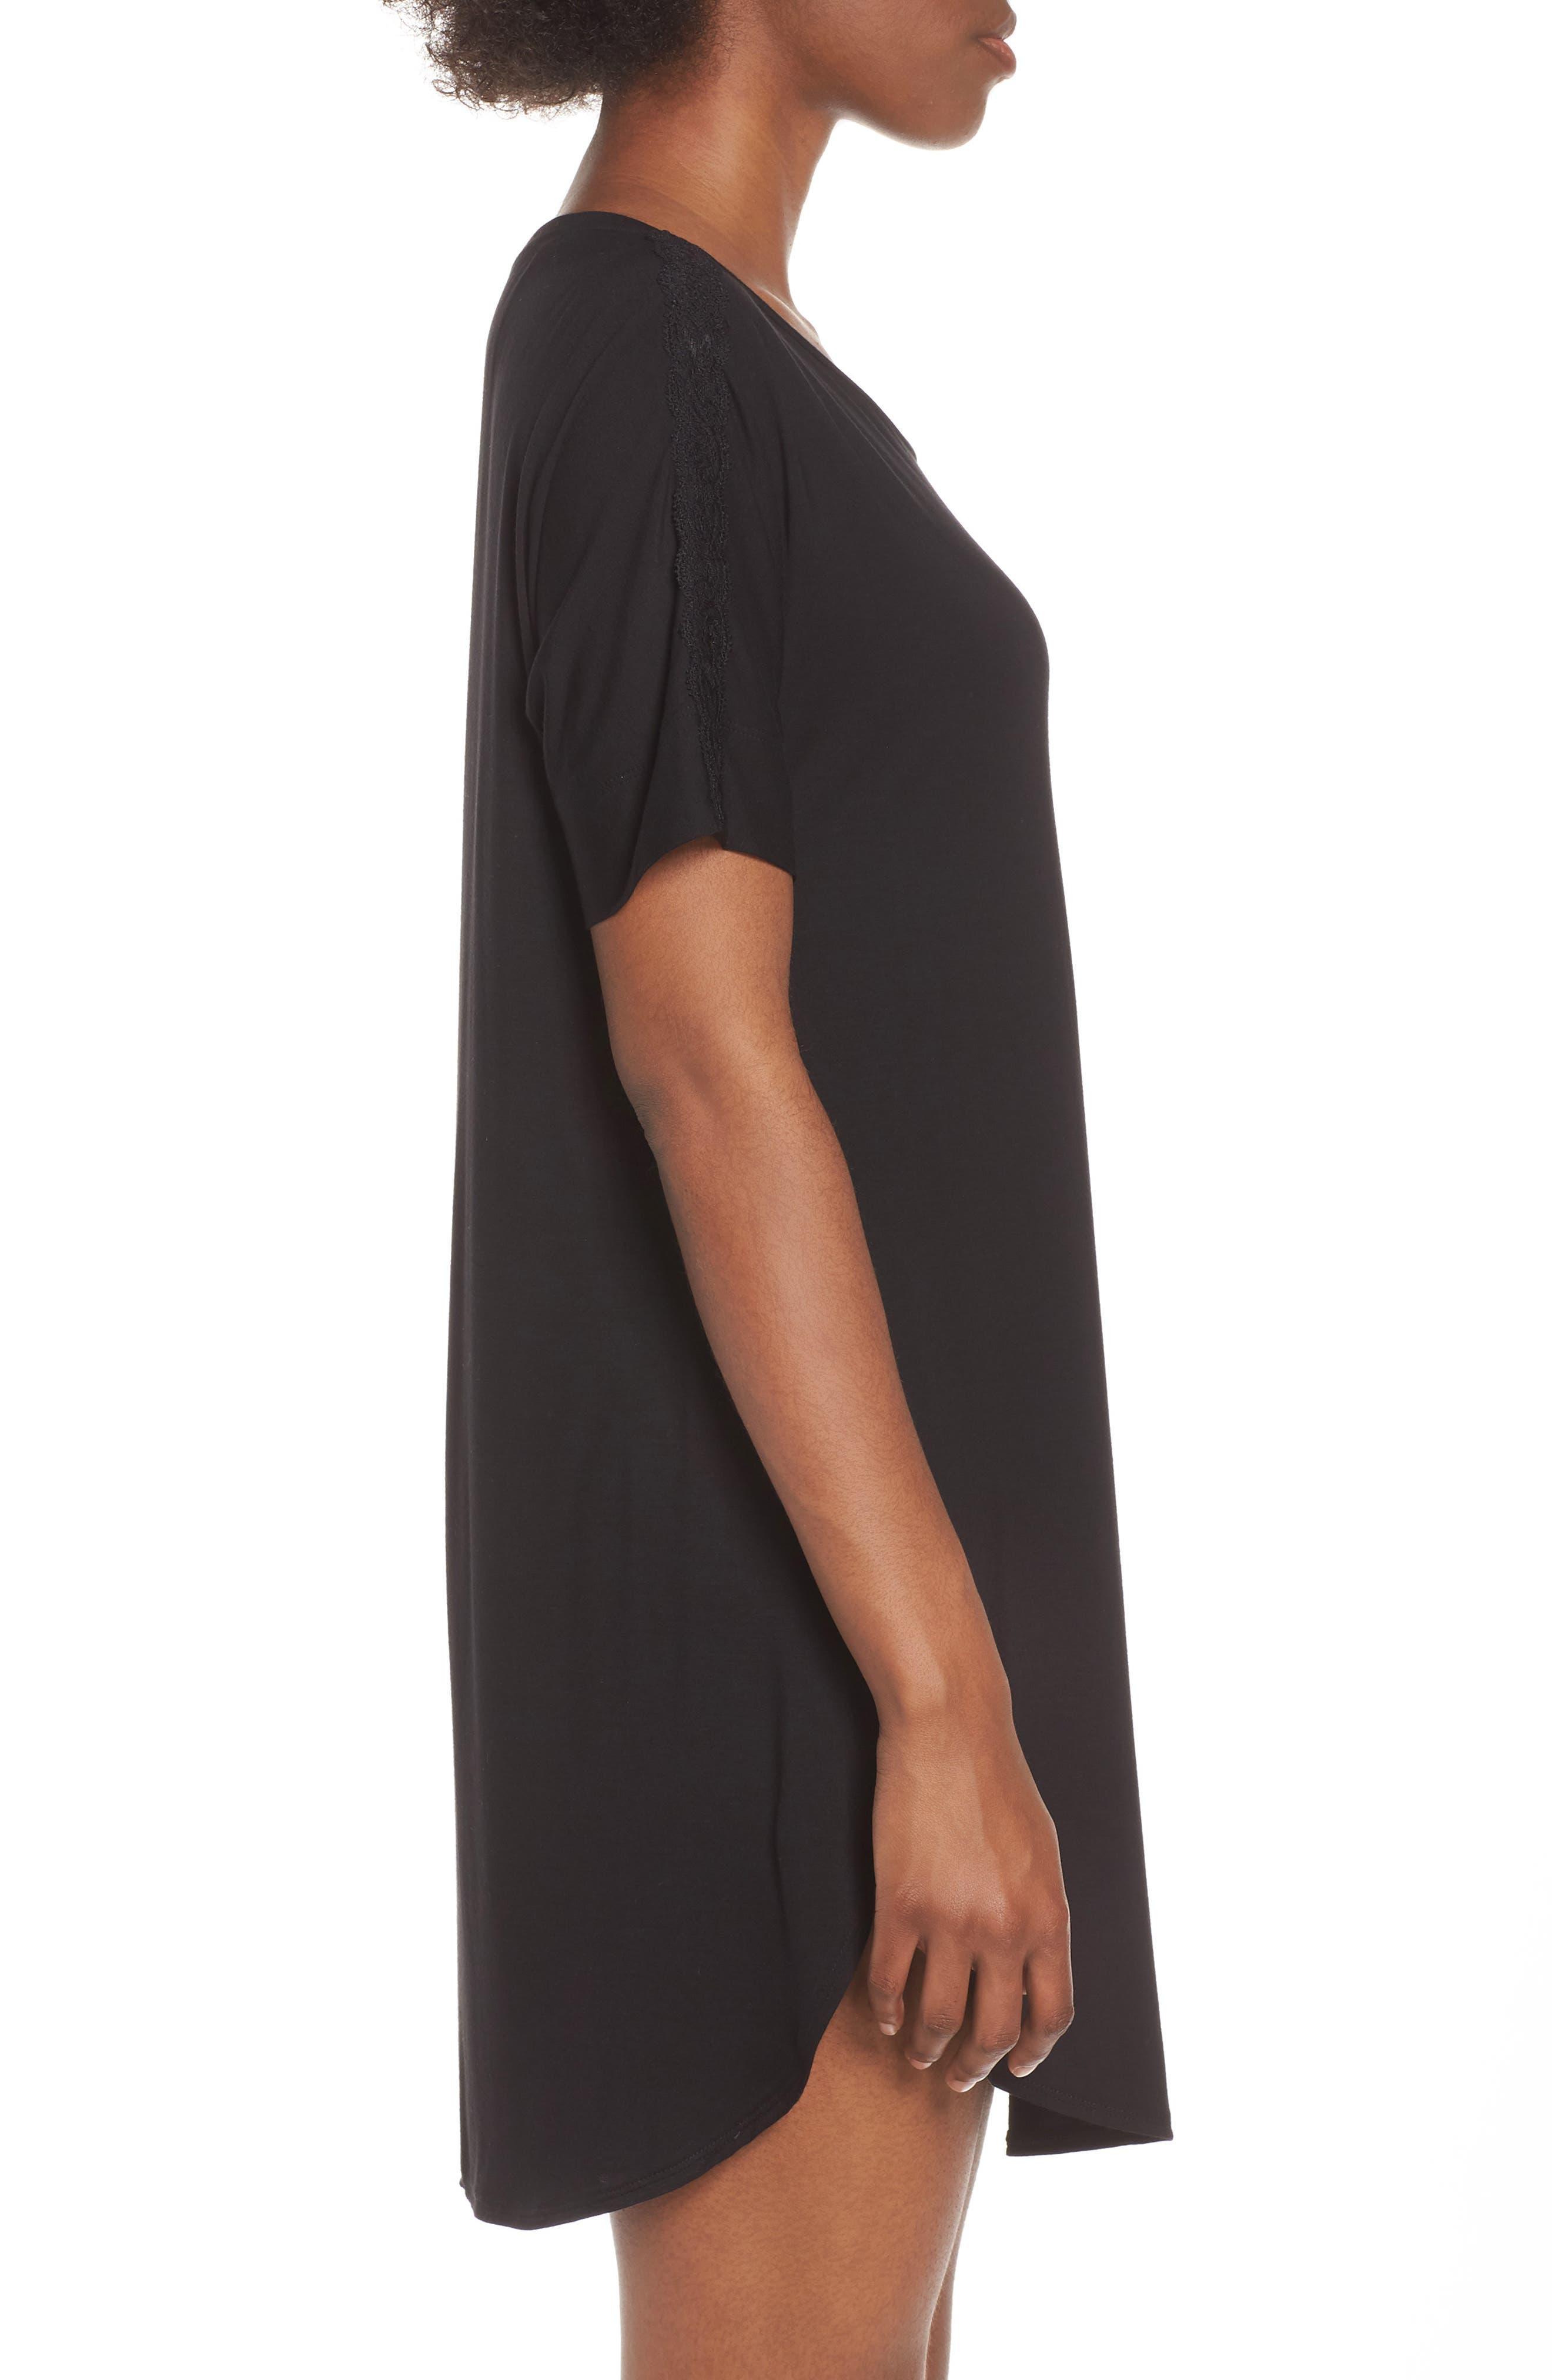 NATORI,                             Feathers Essential Sleep Shirt,                             Alternate thumbnail 3, color,                             BLACK